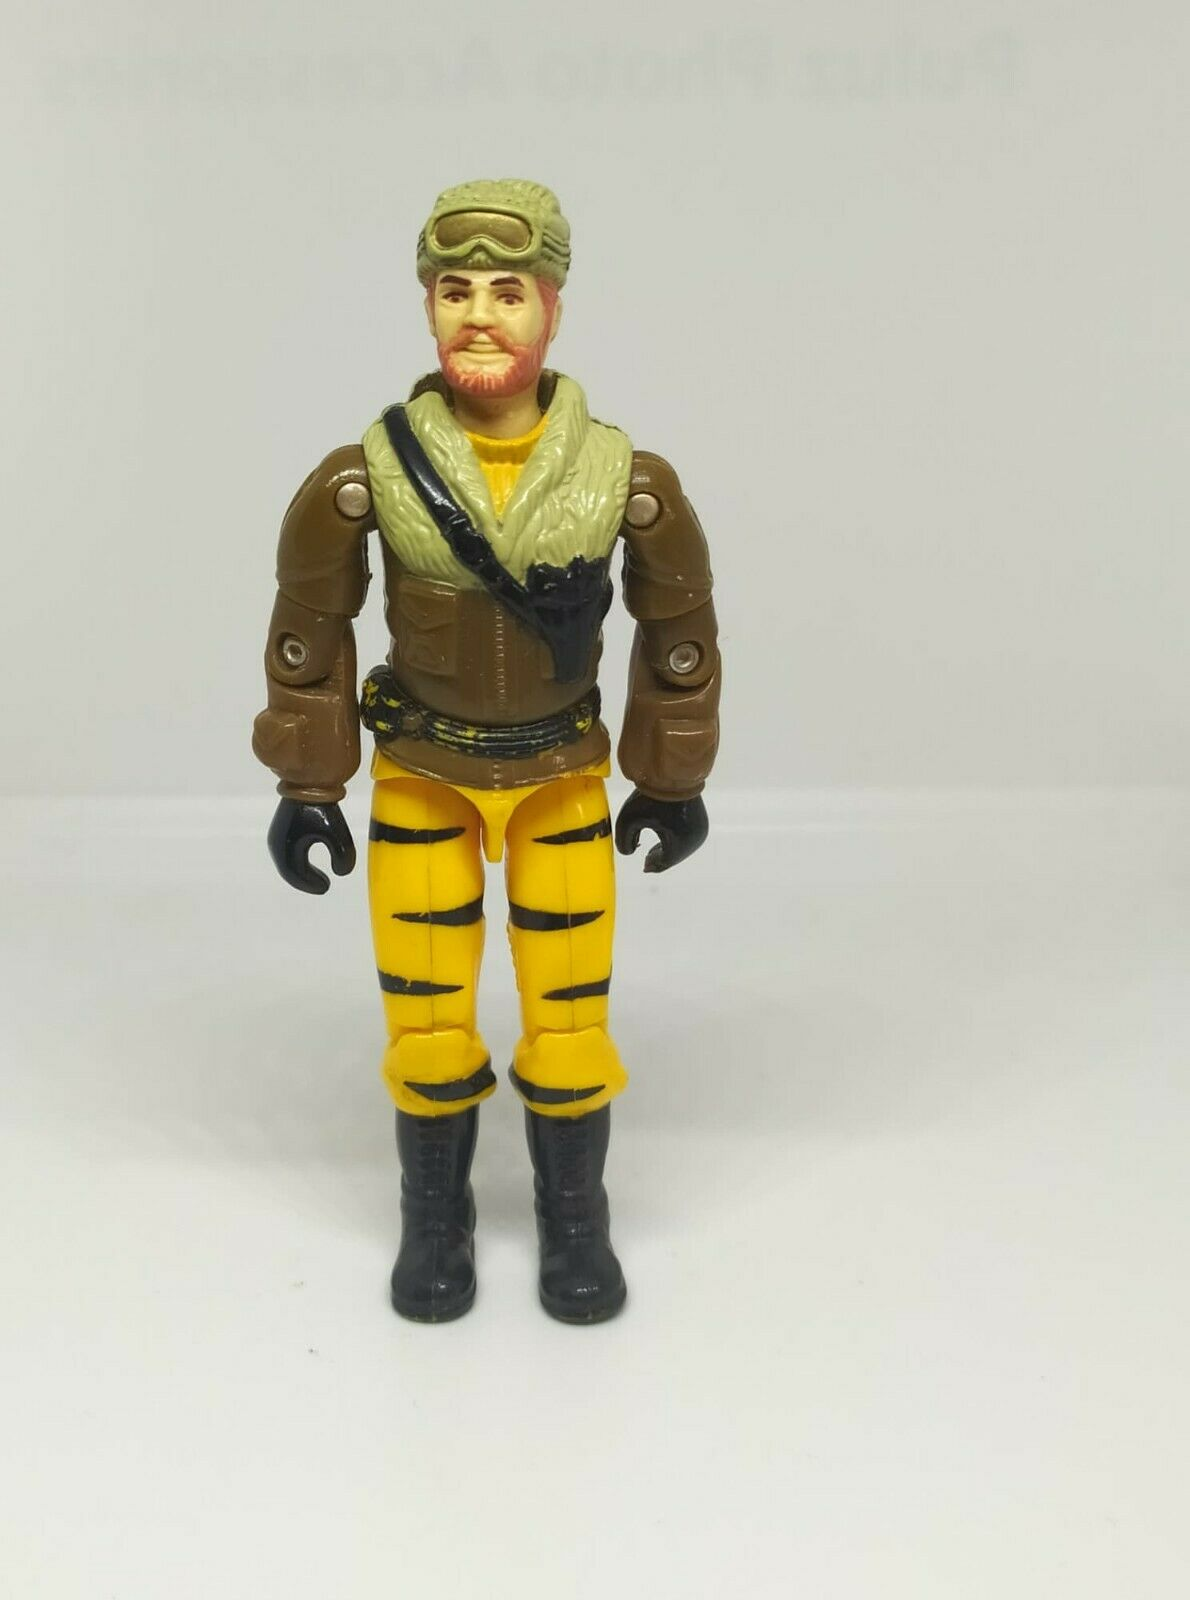 Comandos Heroicos Gi Joe Frostbite Mexico Auriken Rare Variant Vintage 80s Tiger